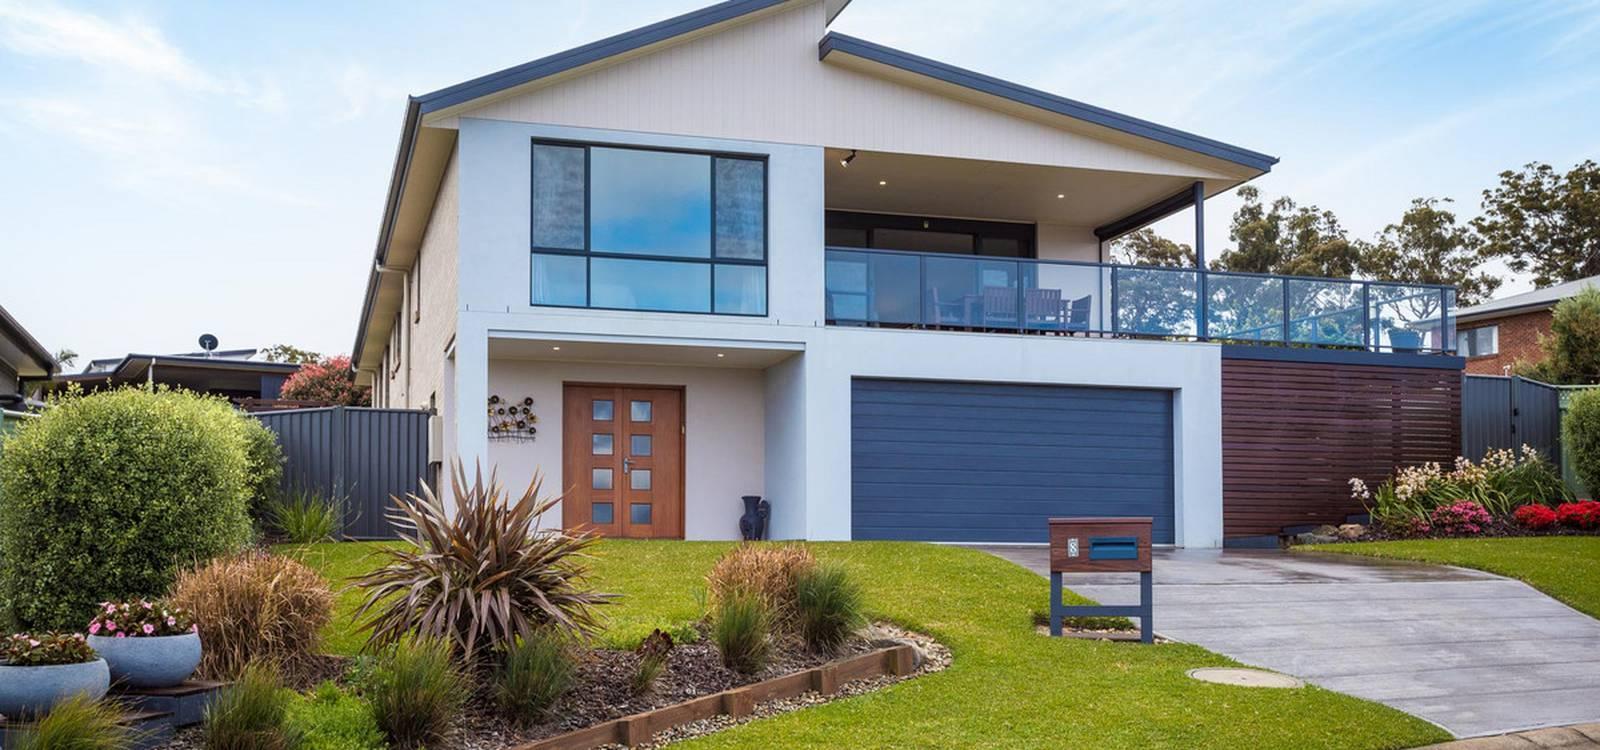 8 Jabiru Place MERIMBULA, NSW 2548 - photo 1